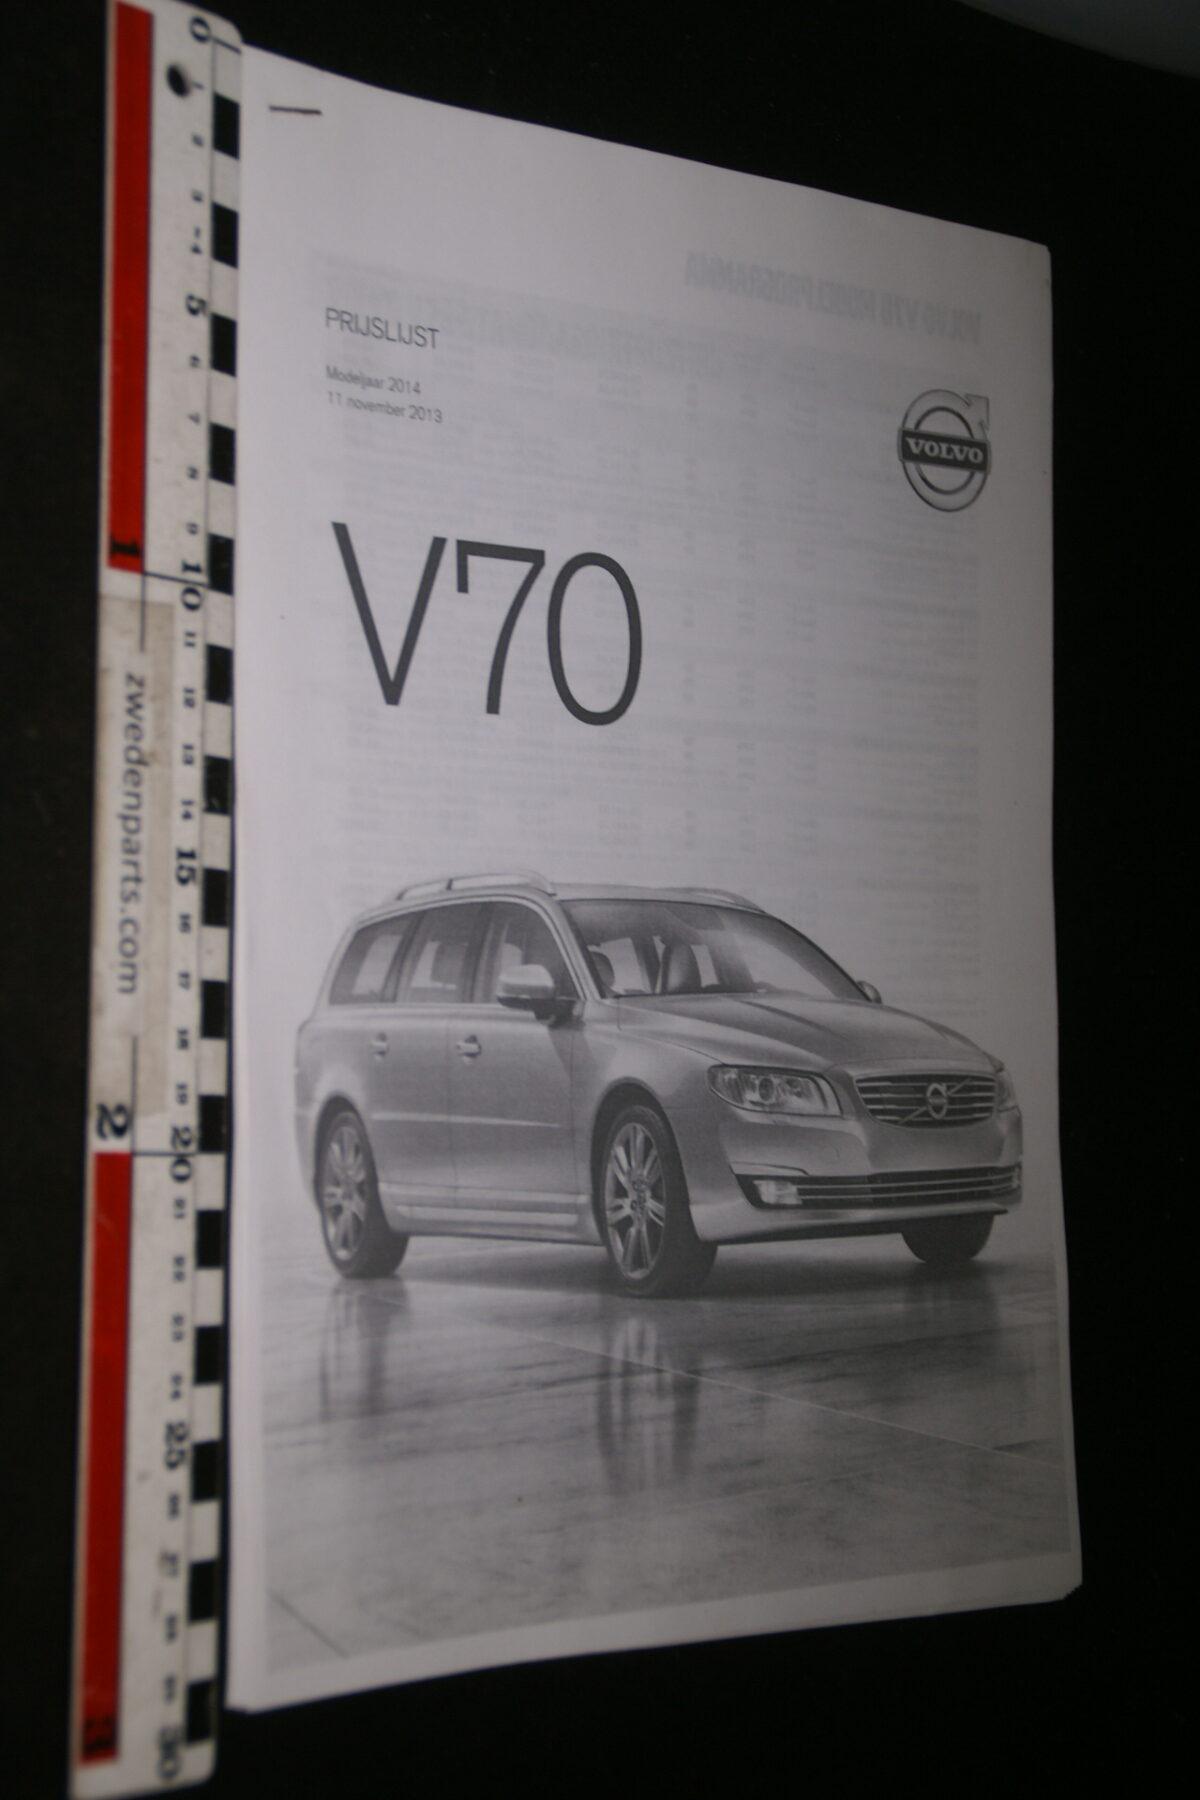 DSC05257 2013 originele brochure Volvo V70-4241468c